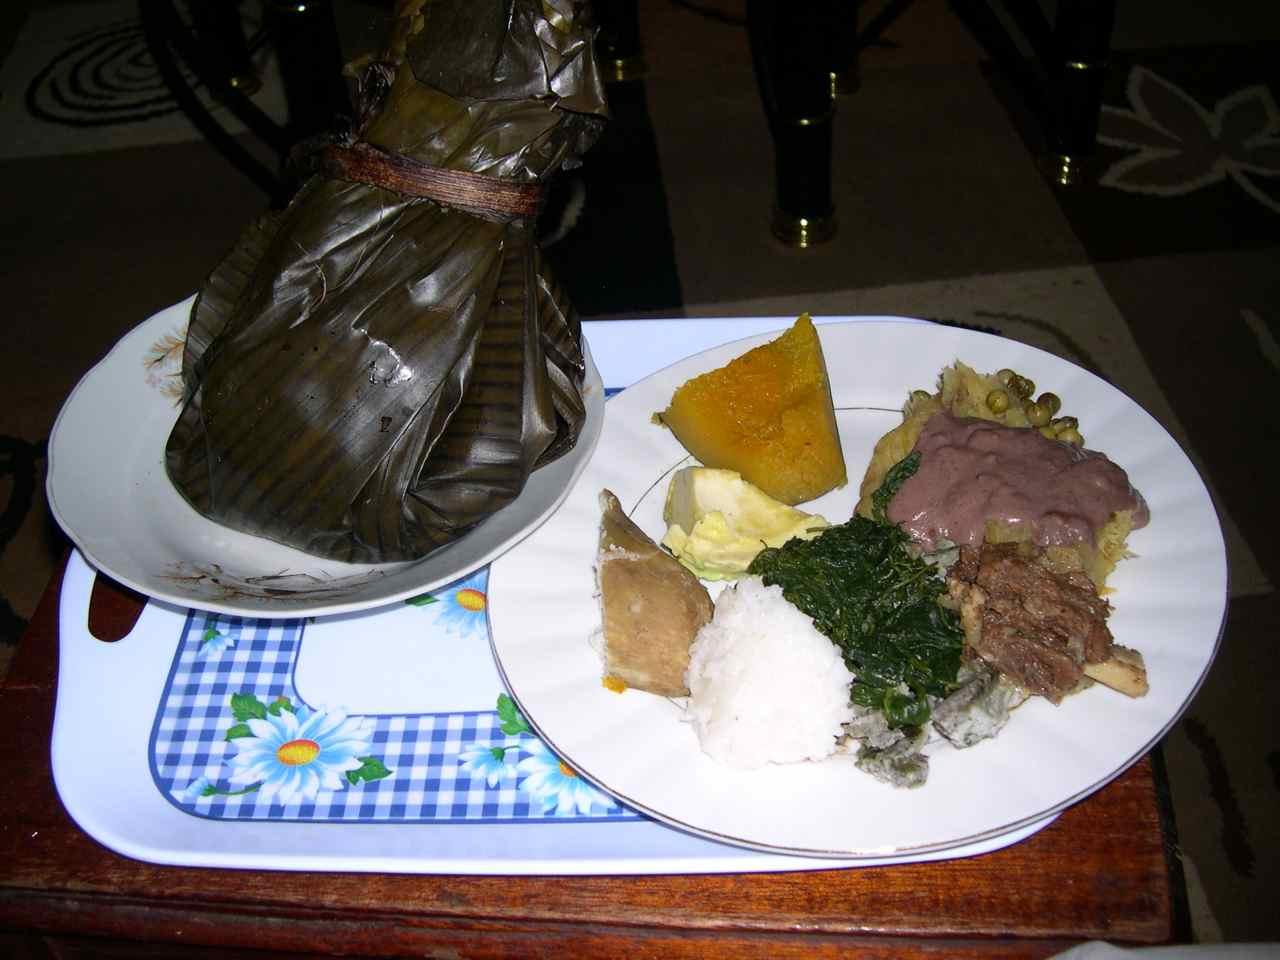 génial  Mot-Clé Uganda Food   Ugandan Foods, Complete guide to Uganda Cuisine